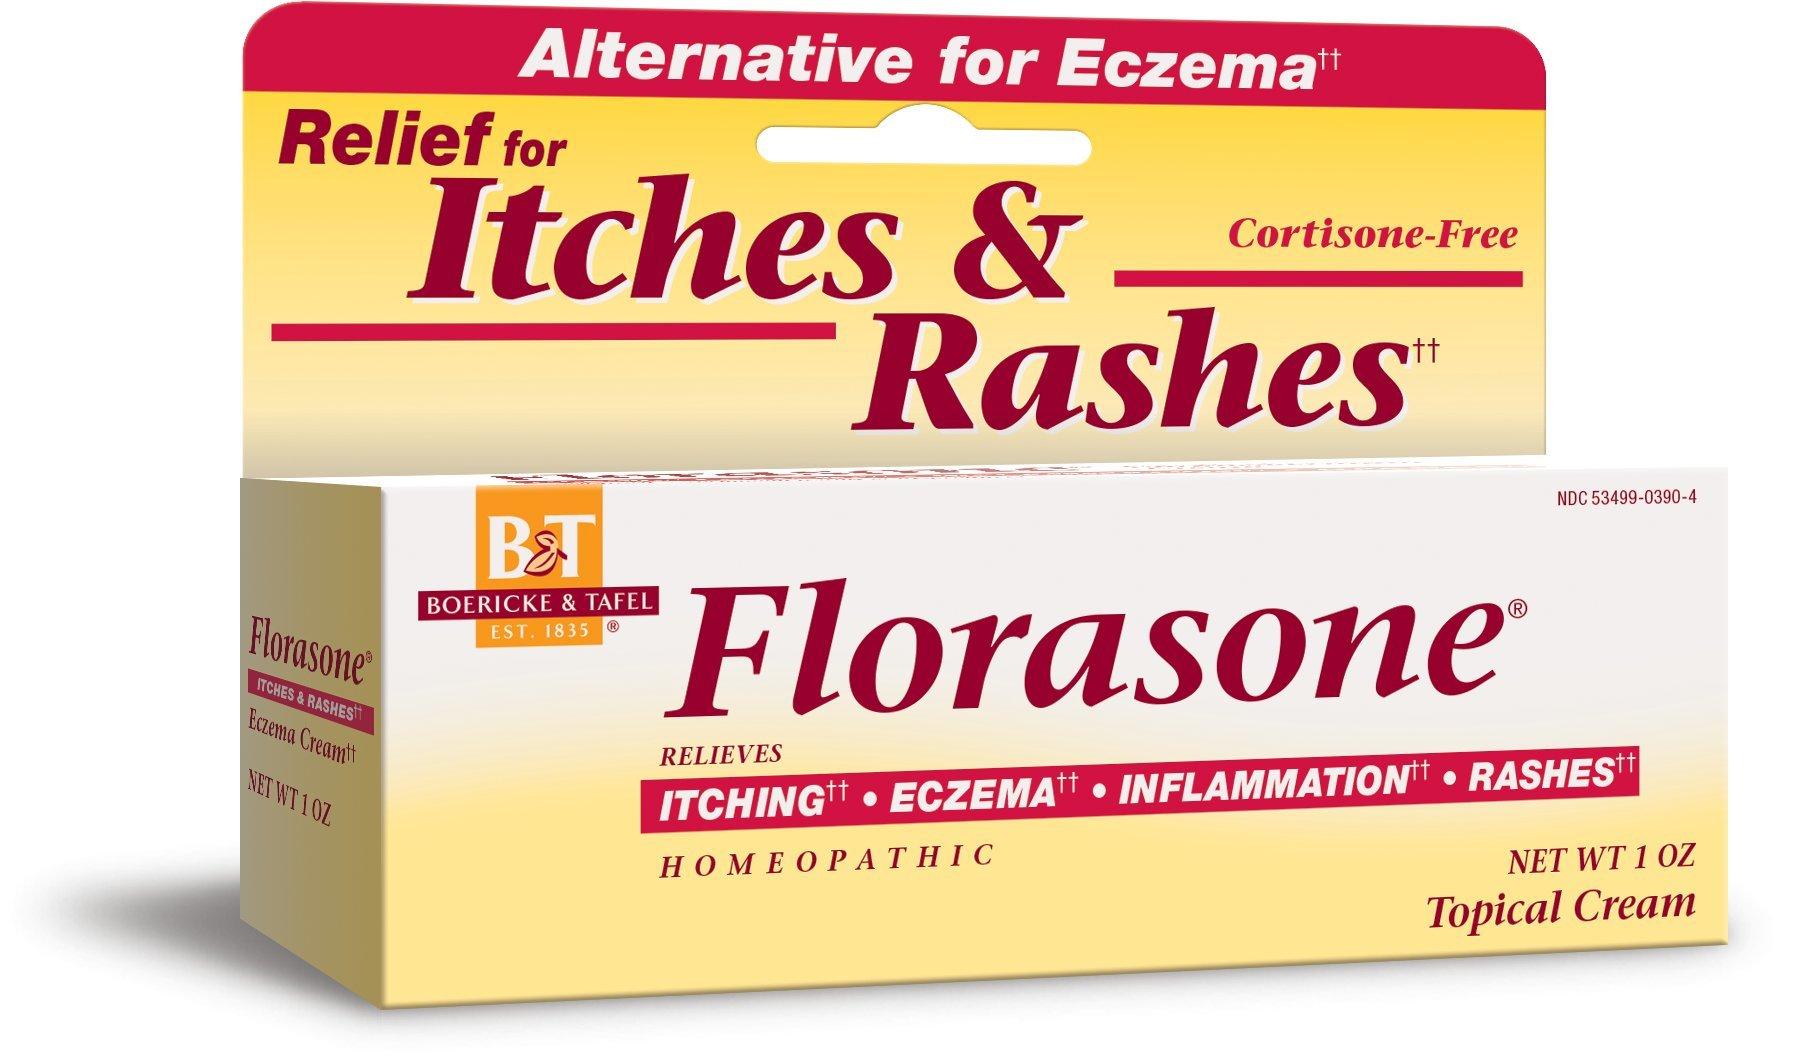 Boericke & Tafel Florasone Itch & Rash Relief Cream, 1 Ounce